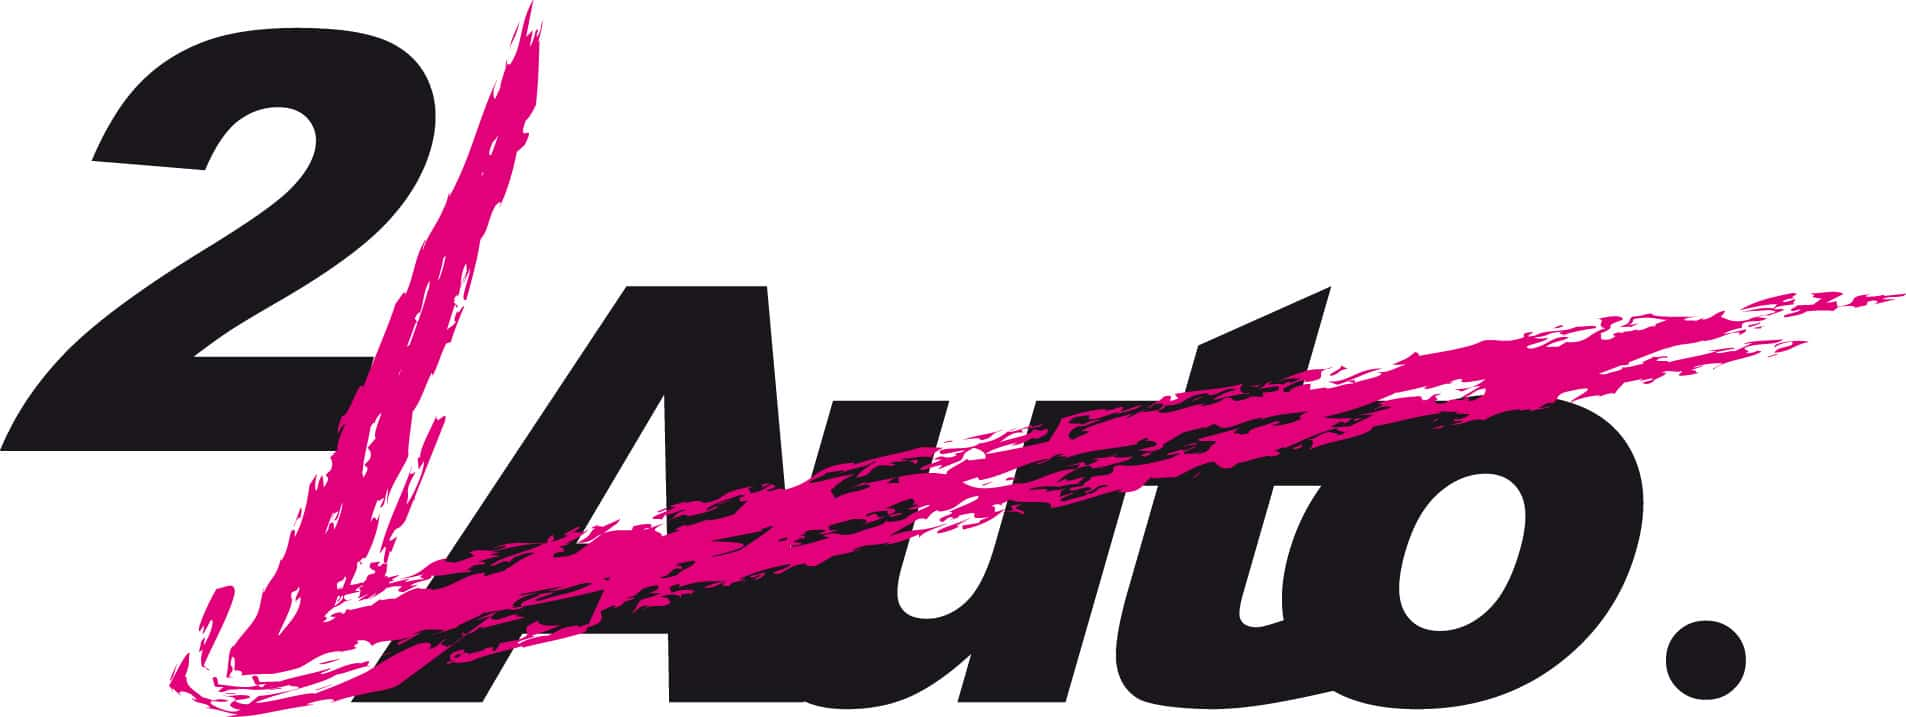 2L-autoFinal-Partenaire Saint Orens Football Club